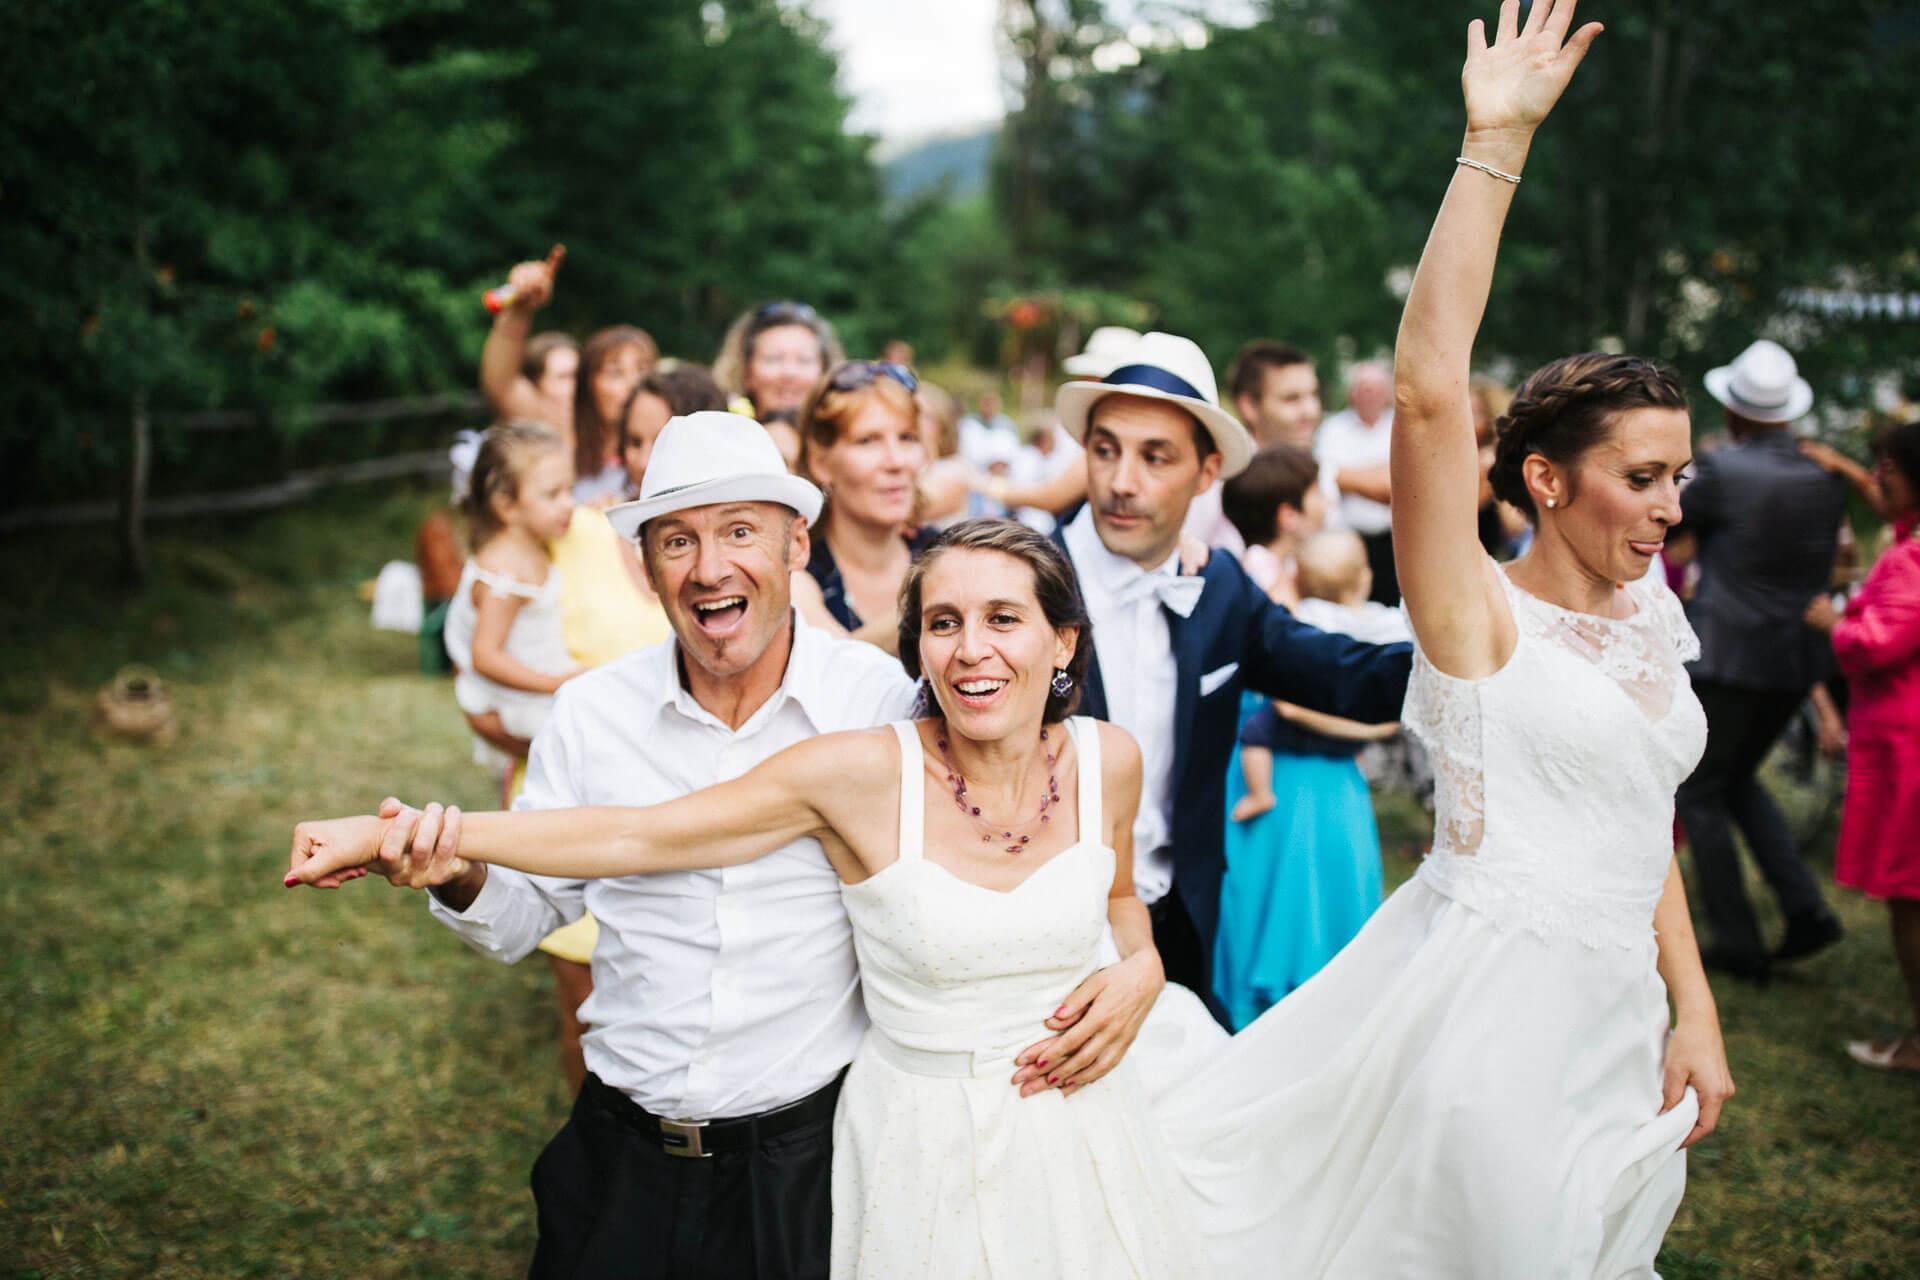 photographe-mariage-alpes-montagne-12